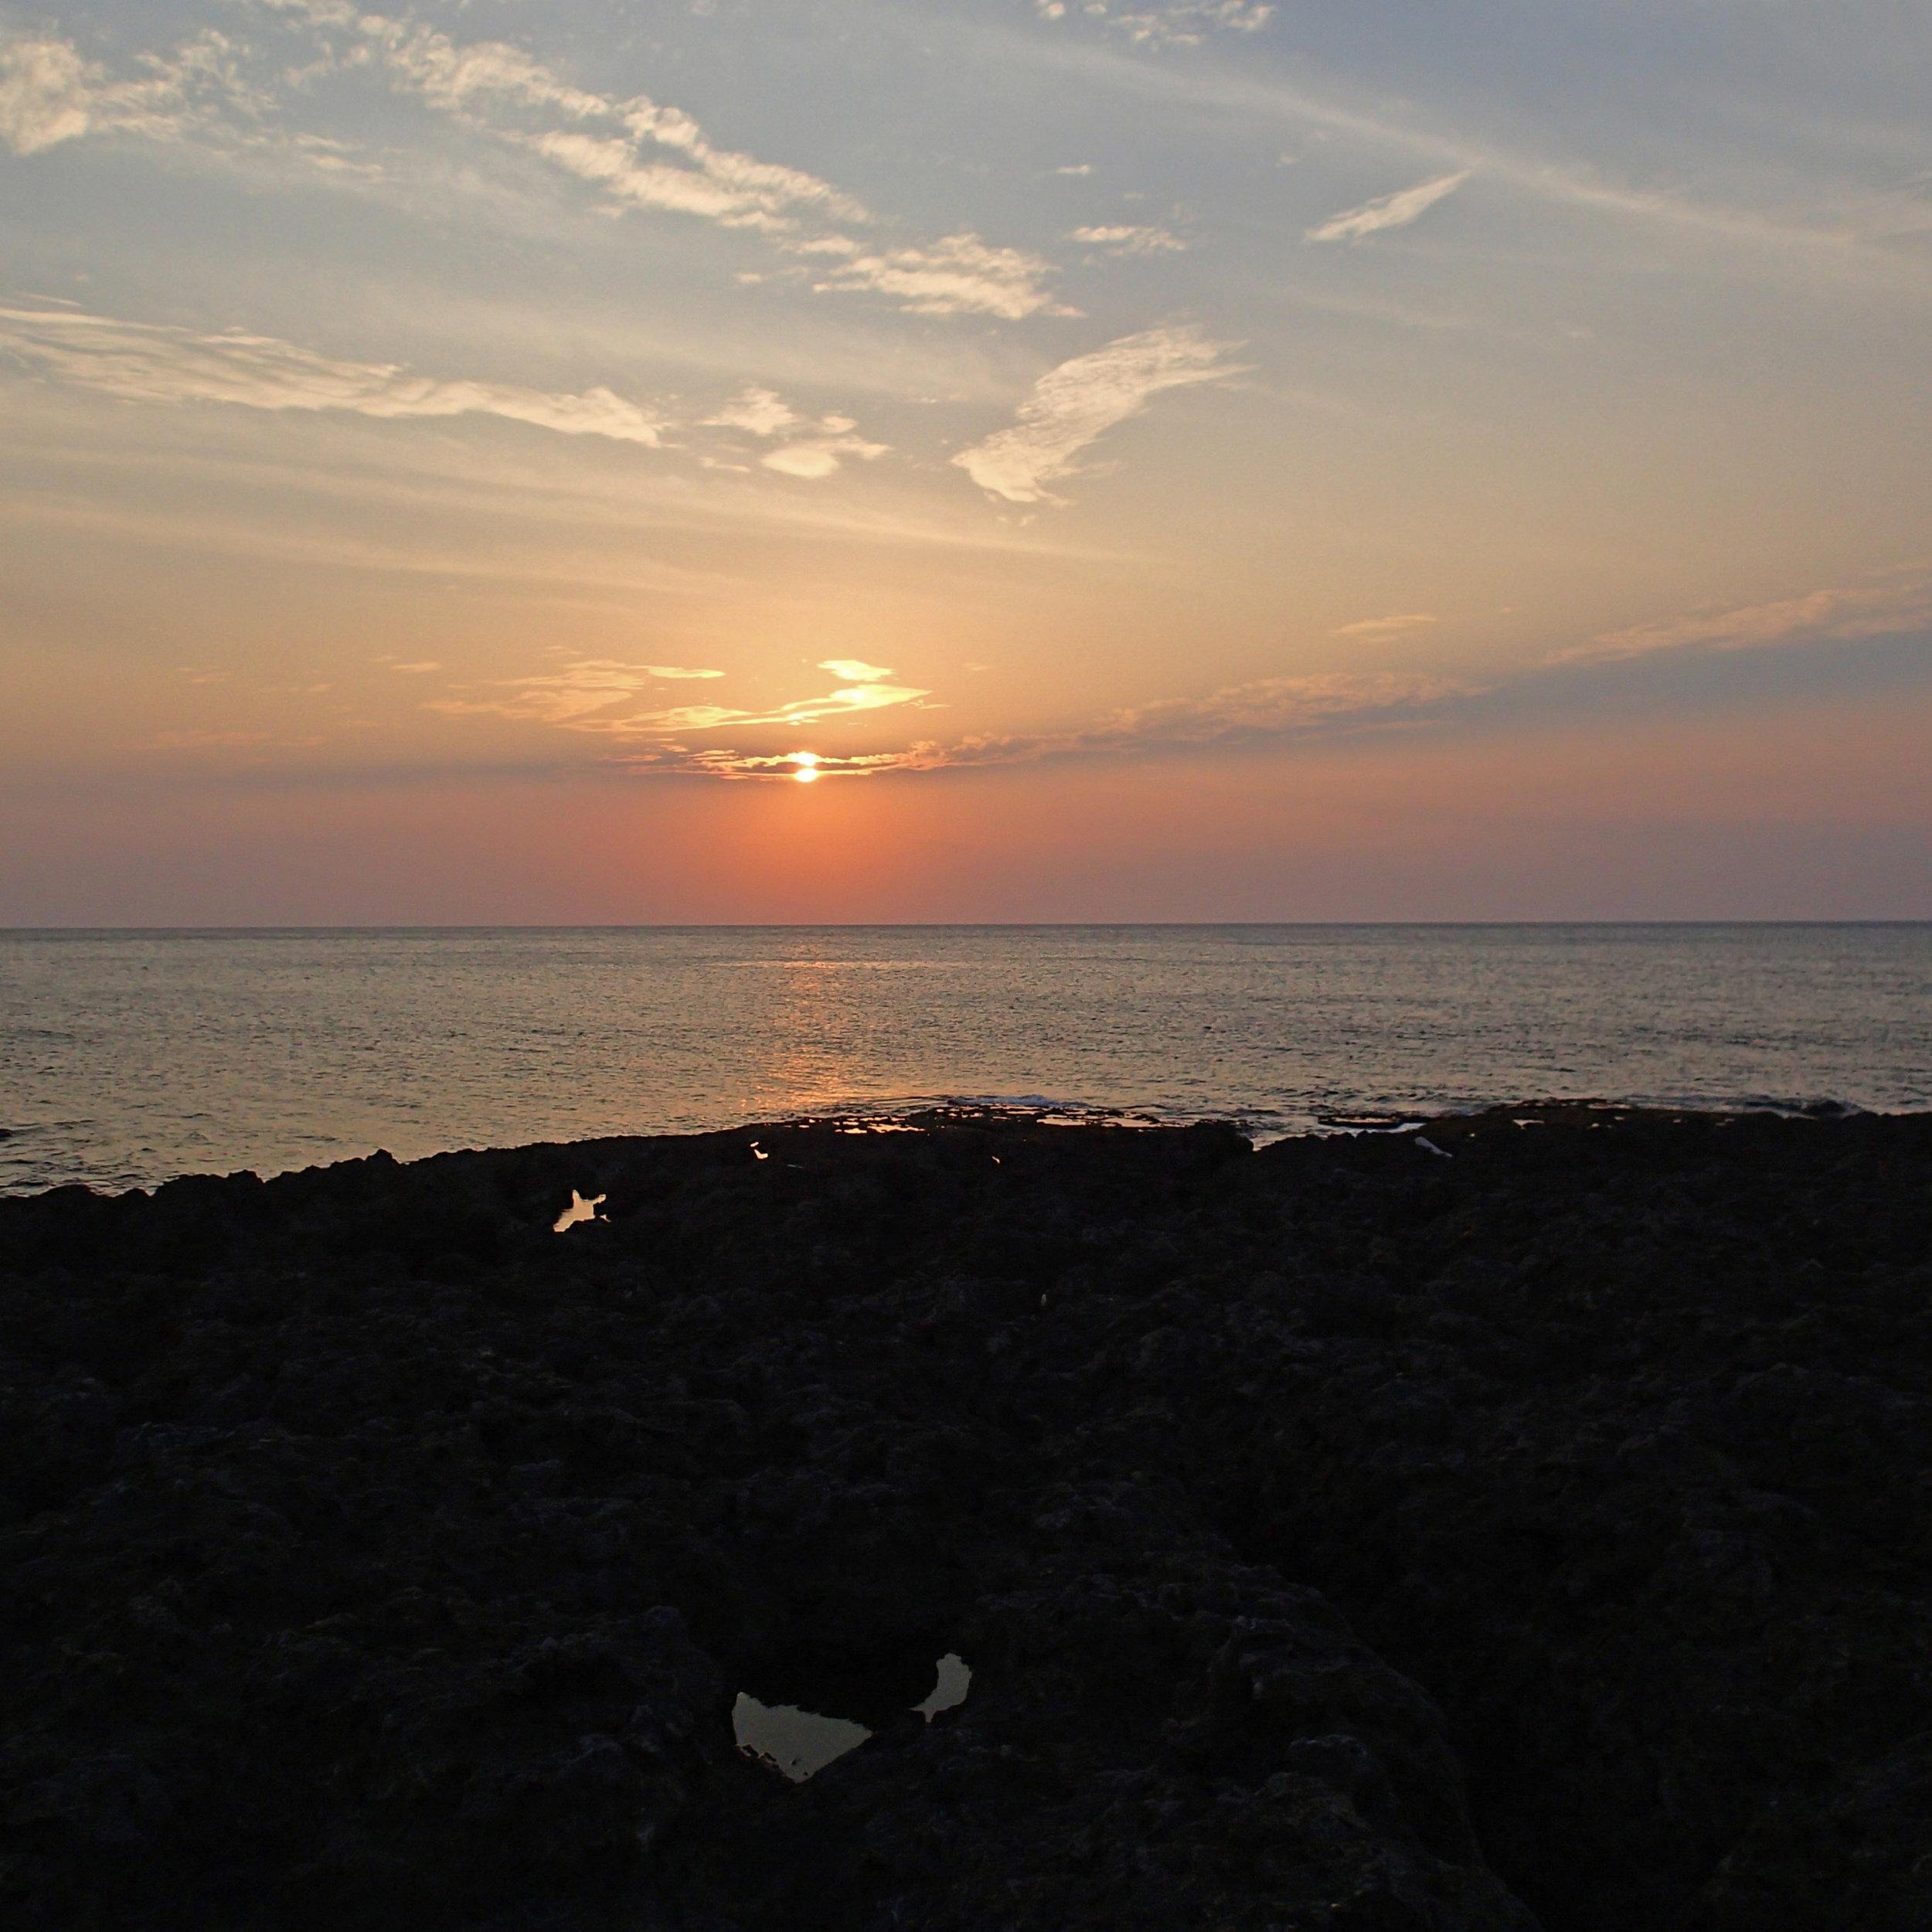 2016-5-1 sunset.jpg